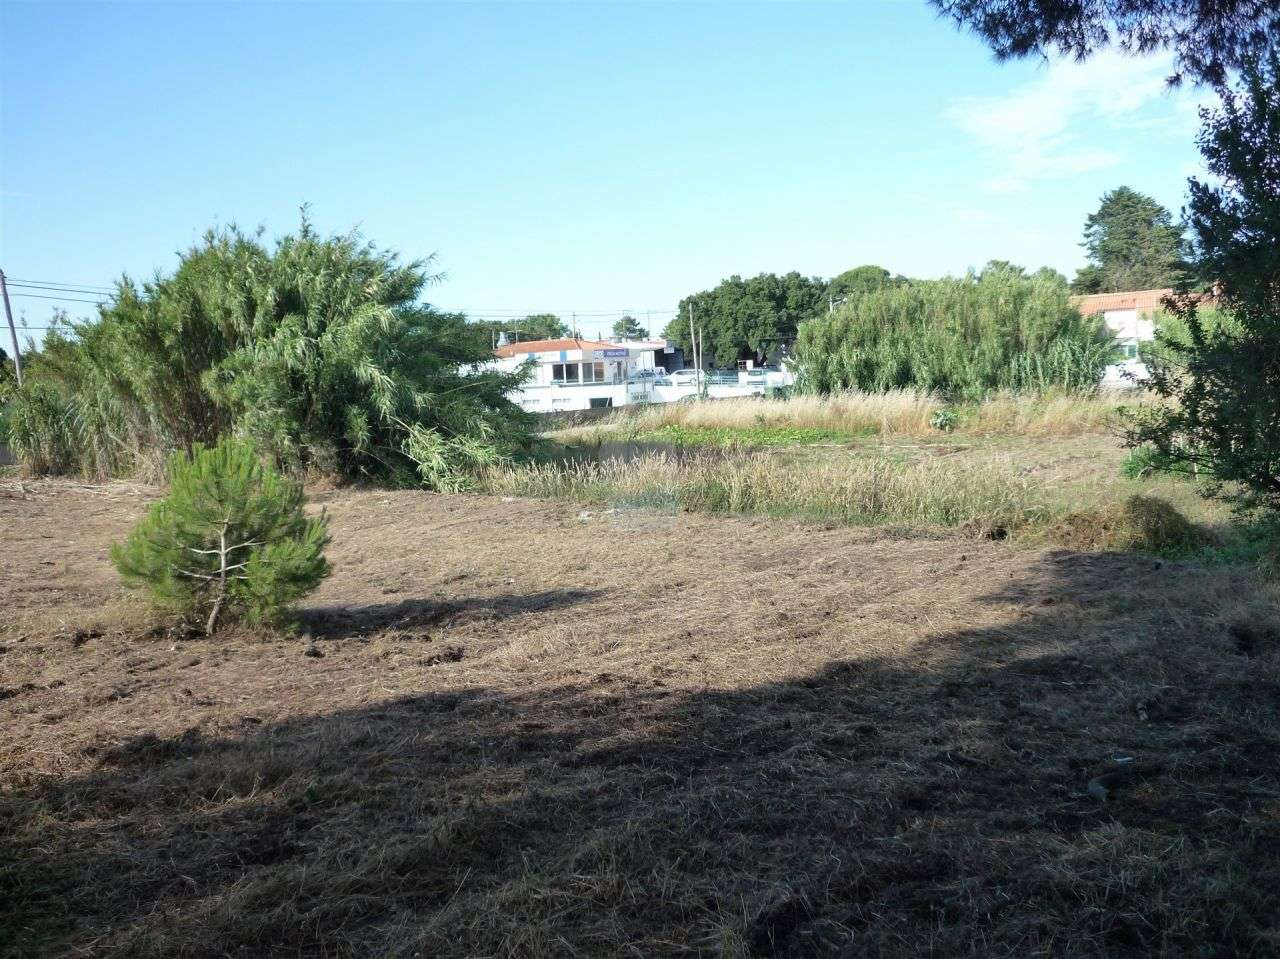 Terreno para comprar, Castelo (Sesimbra), Setúbal - Foto 7